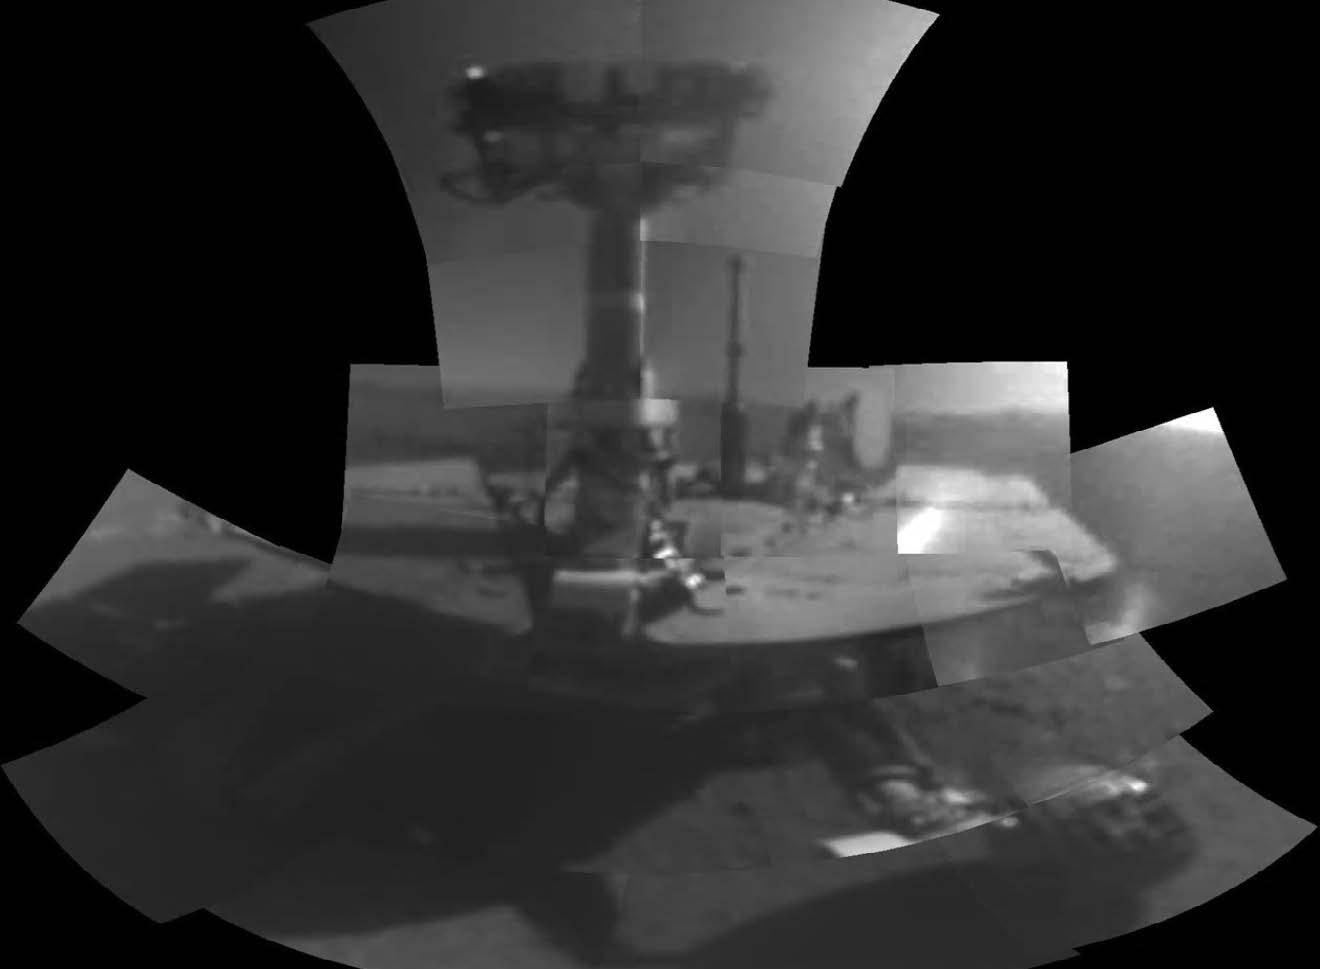 Crédito de la imagen: NASA/JPL-Caltech